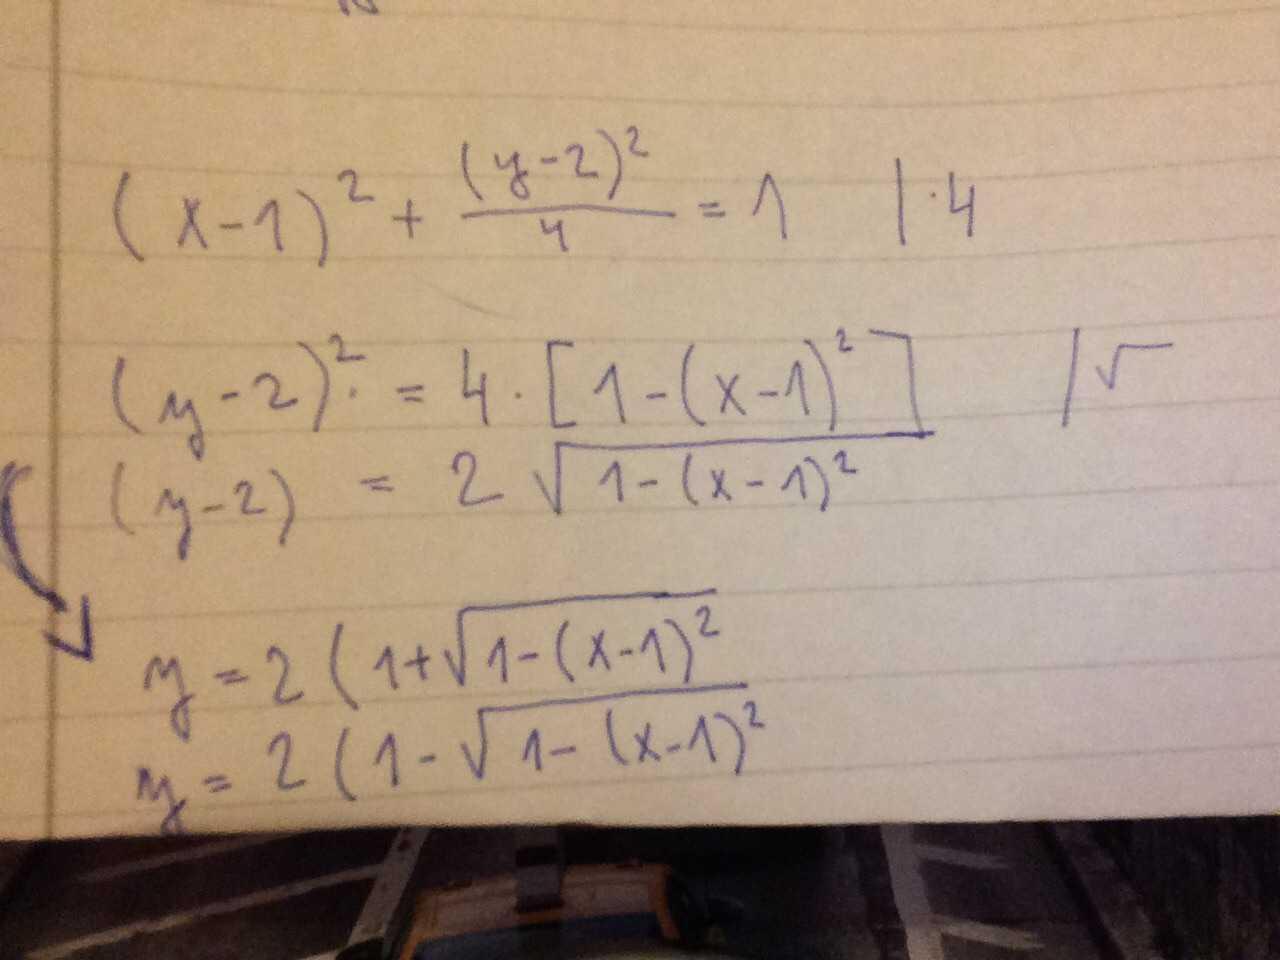 http://forum.matematika.cz/upload3/img/2018-02/13879_image.jpg